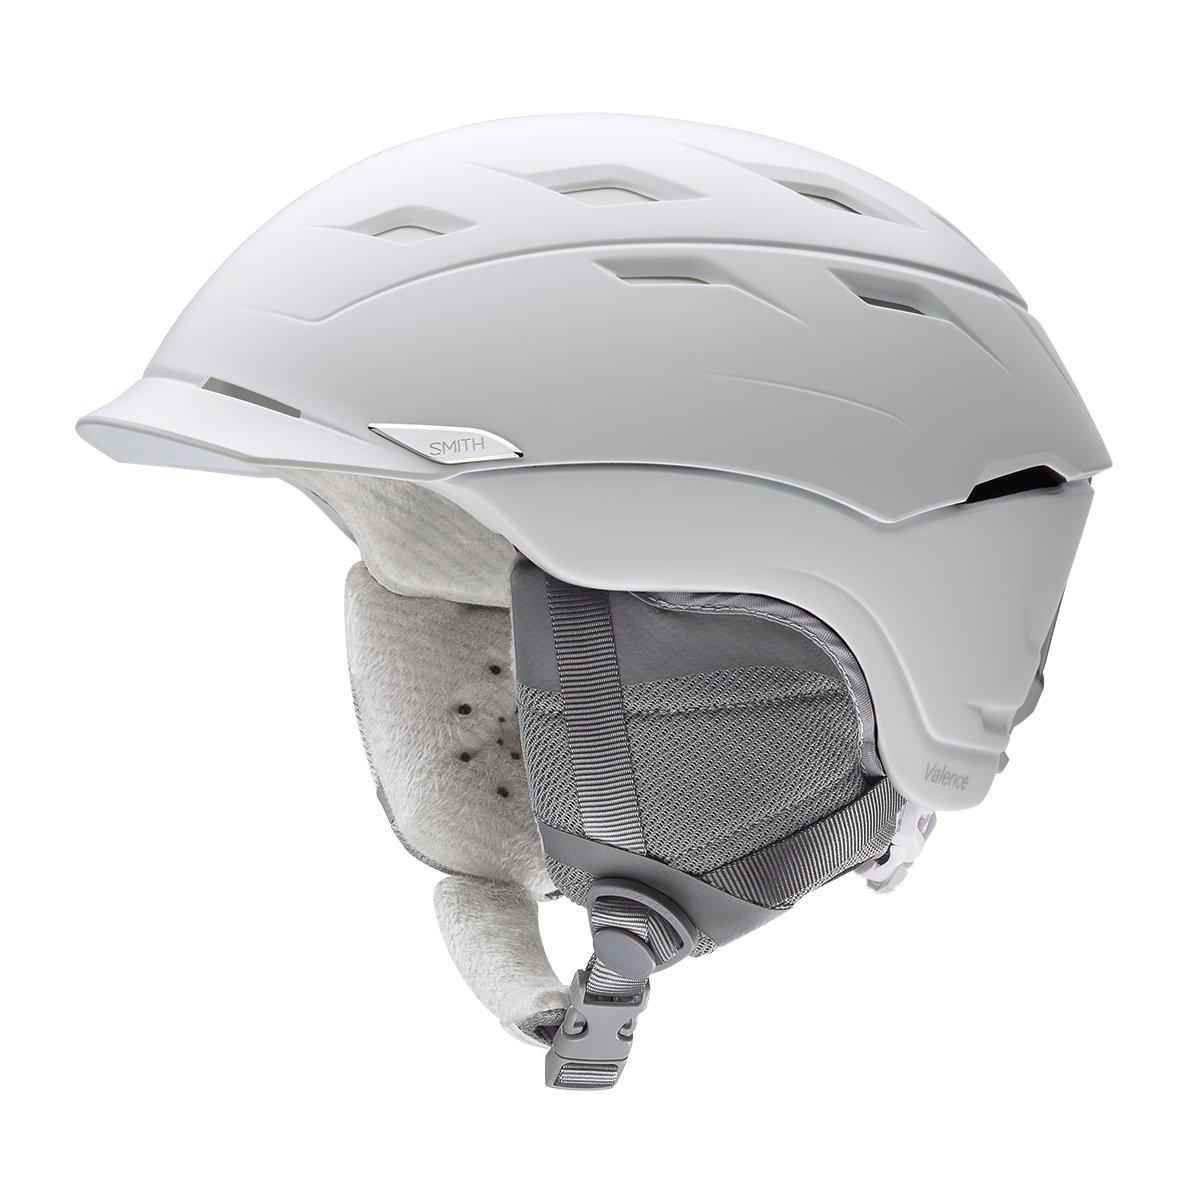 Smith Valence Womens snow Helmet